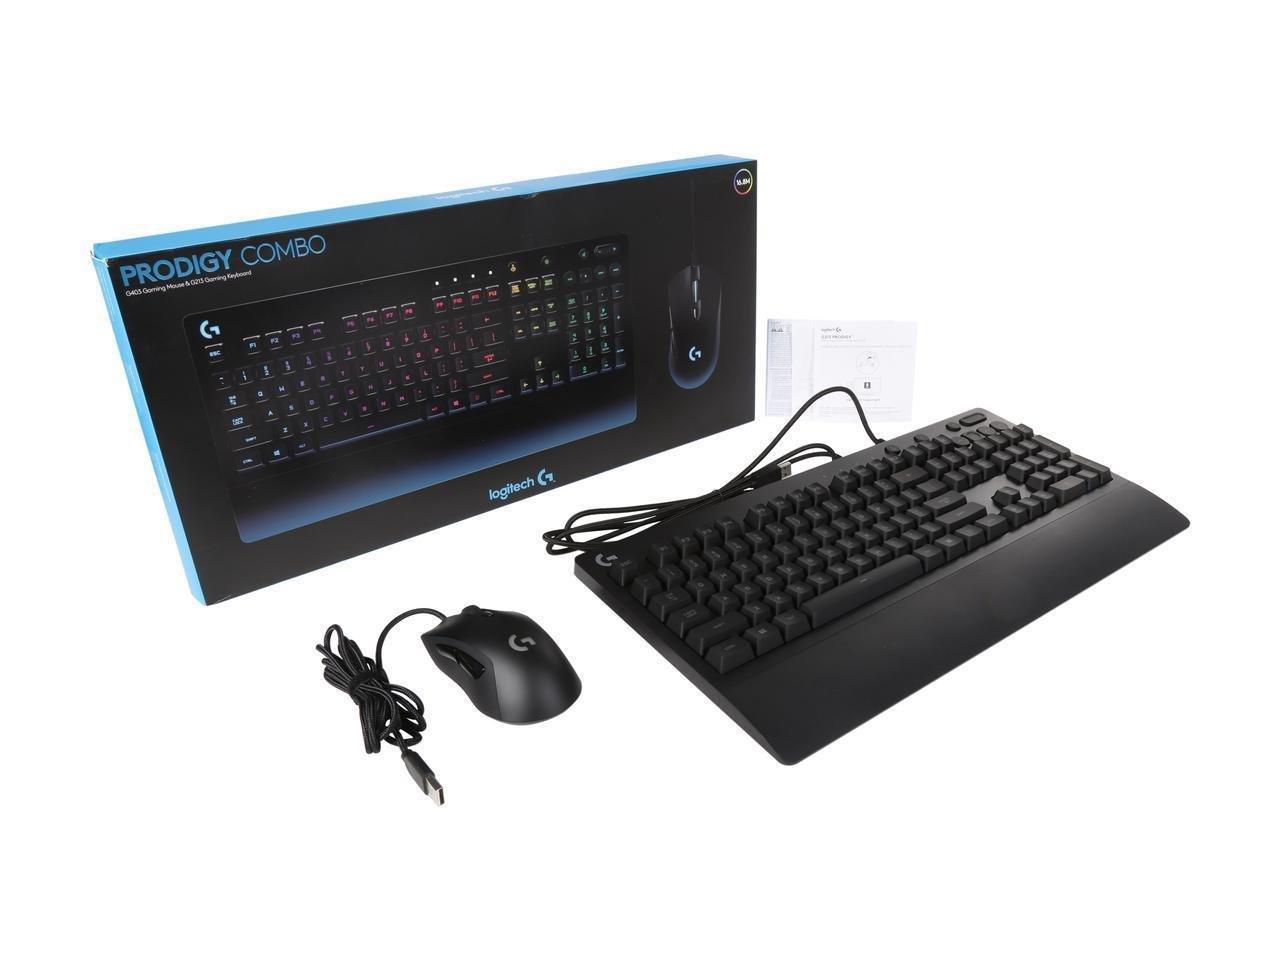 Logitech Prodigy G403 Gaming Mouse & G213 Gaming Keyboard Combo